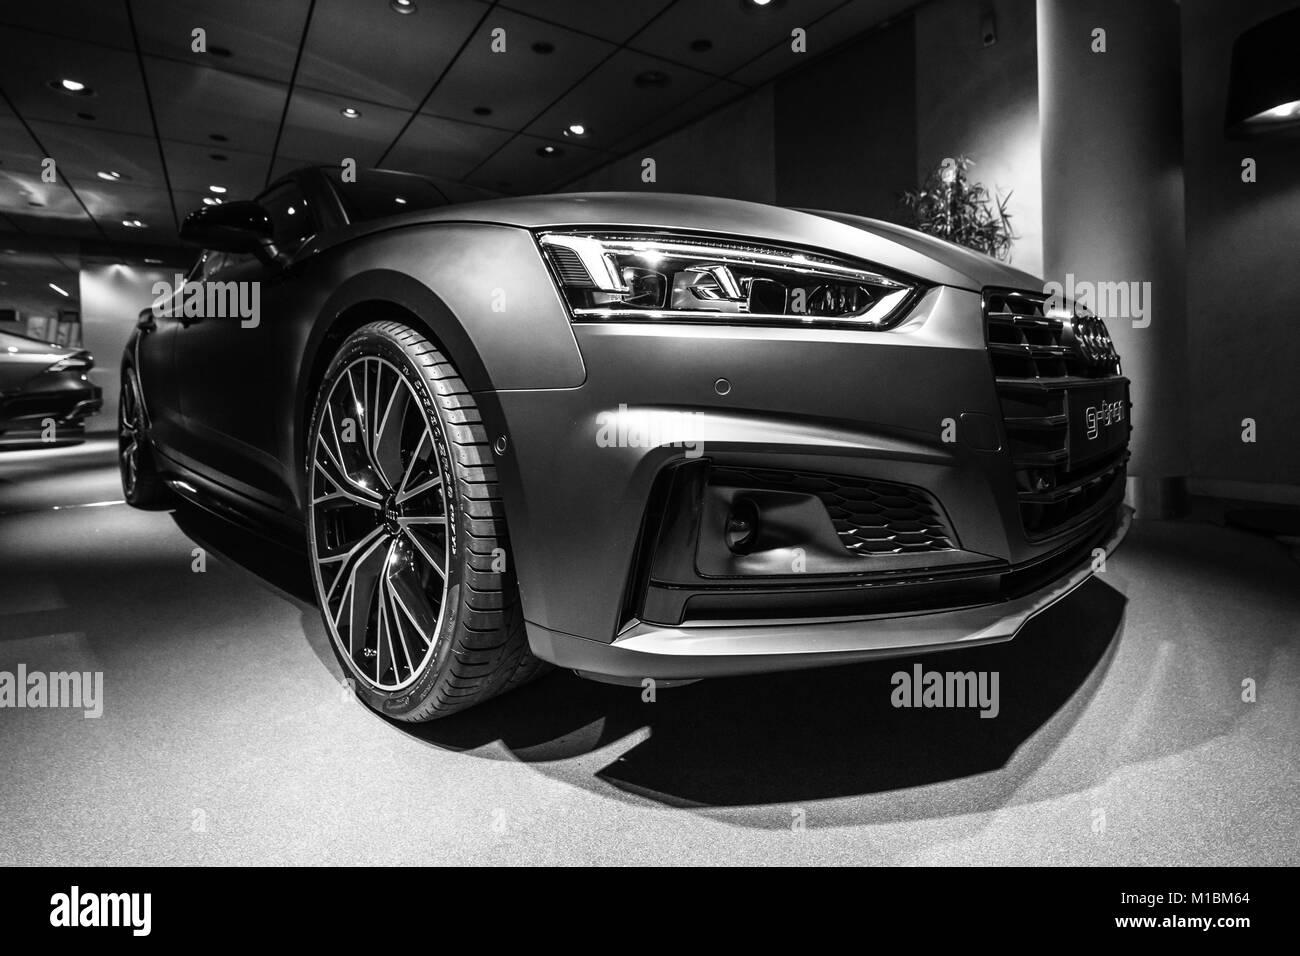 Audi A5 Sportback Stockfotos Audi A5 Sportback Bilder Alamy